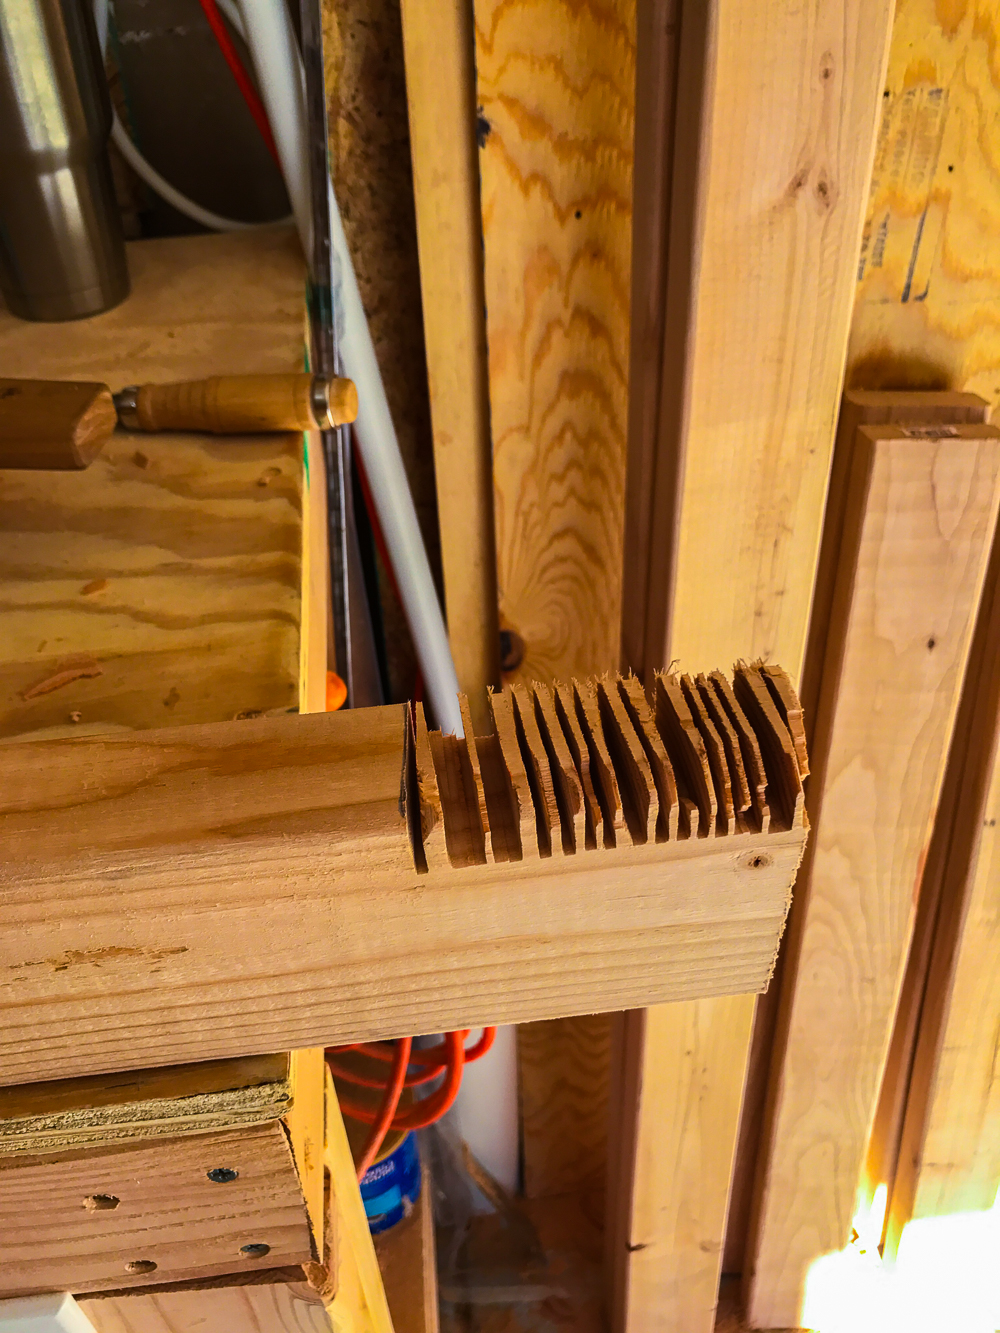 Lumber Cart - Cutting Tenons with Circular Saw